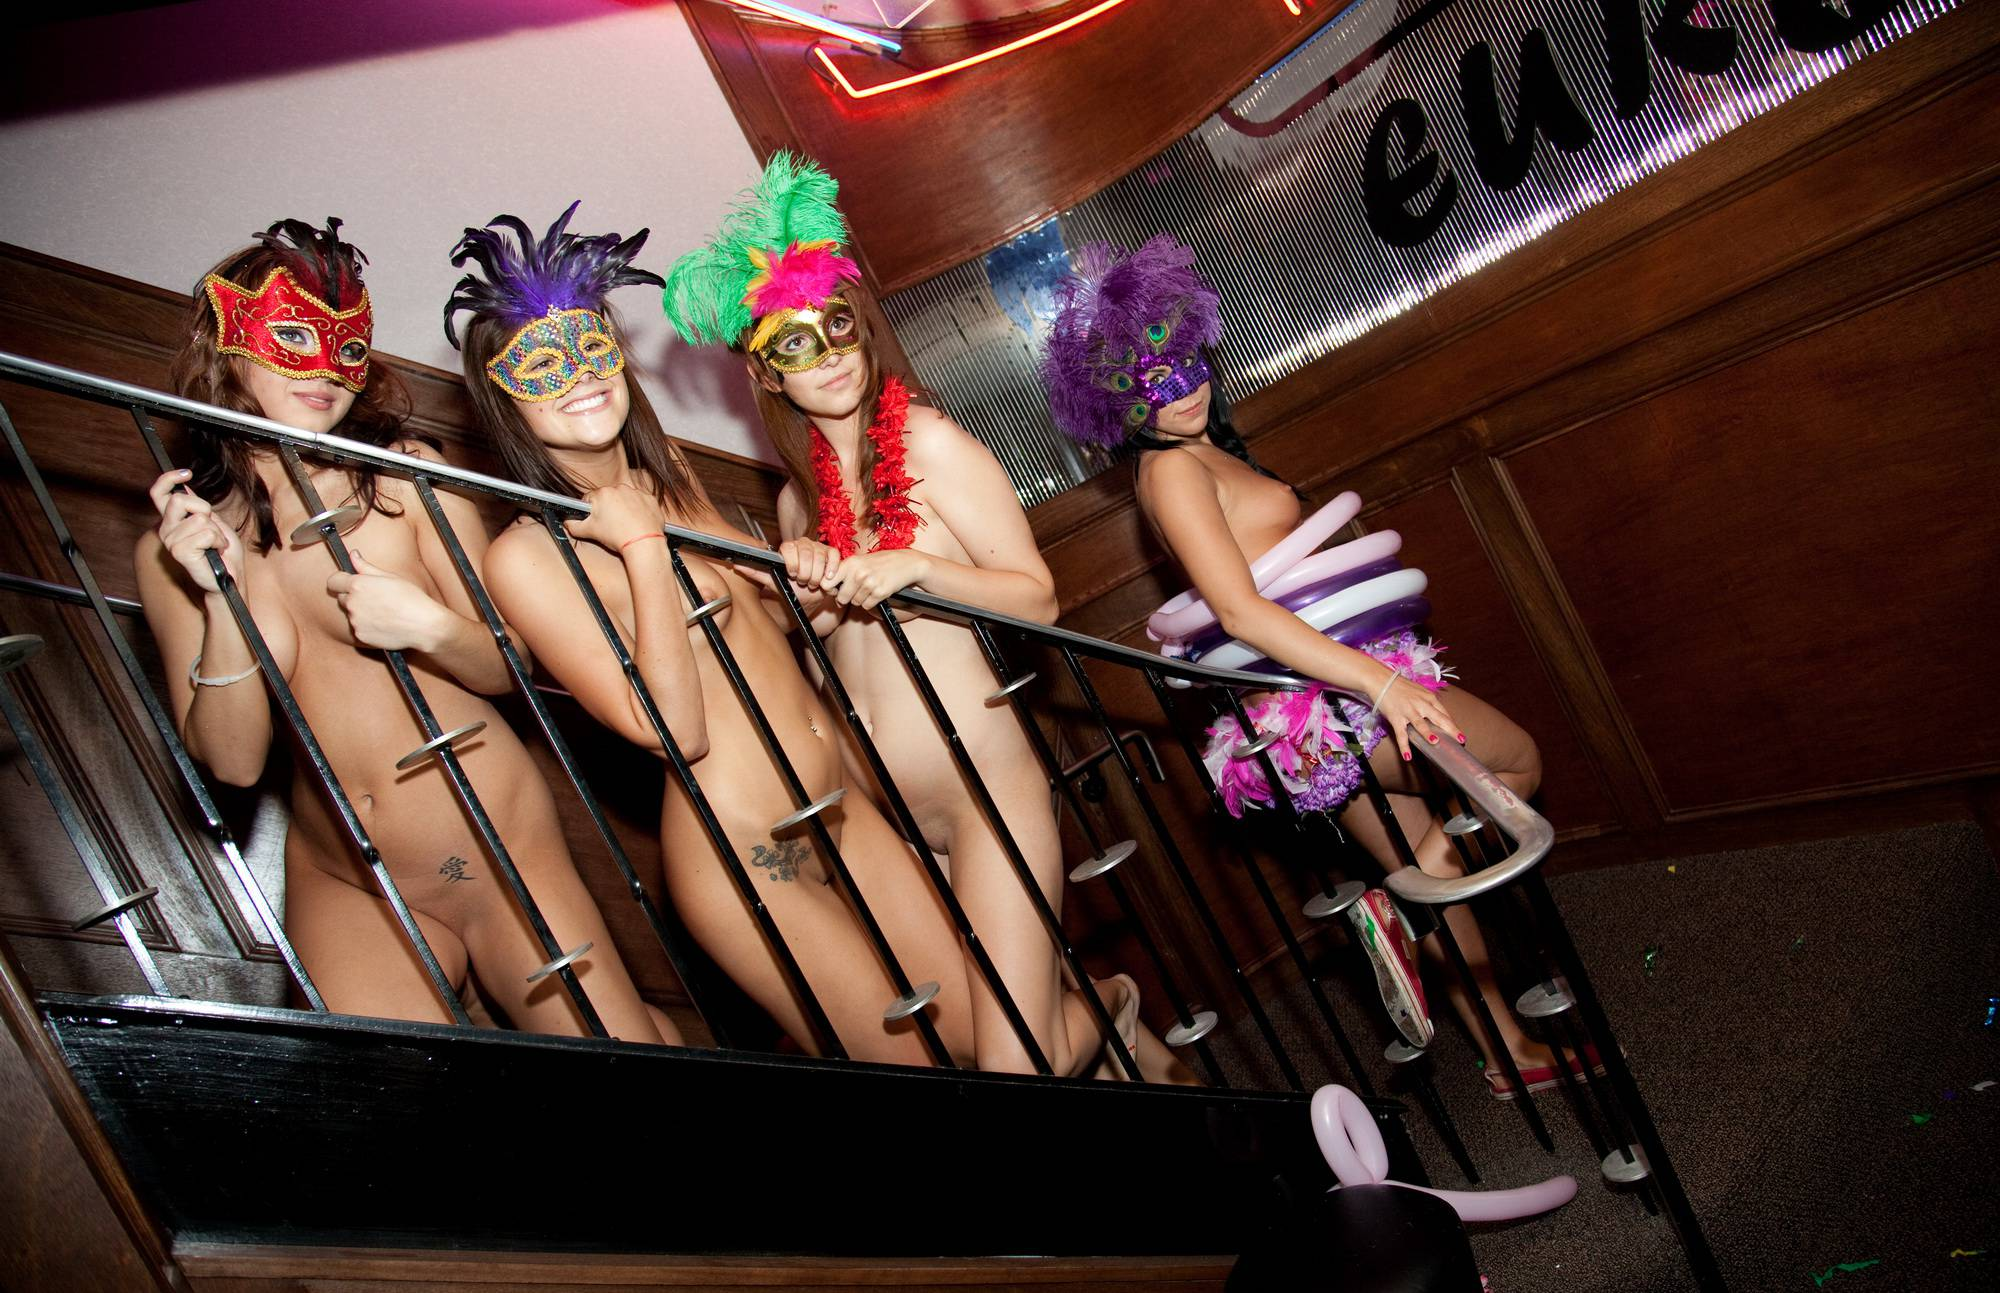 Purenudism Pics Masquerade Stairs Galore - 1